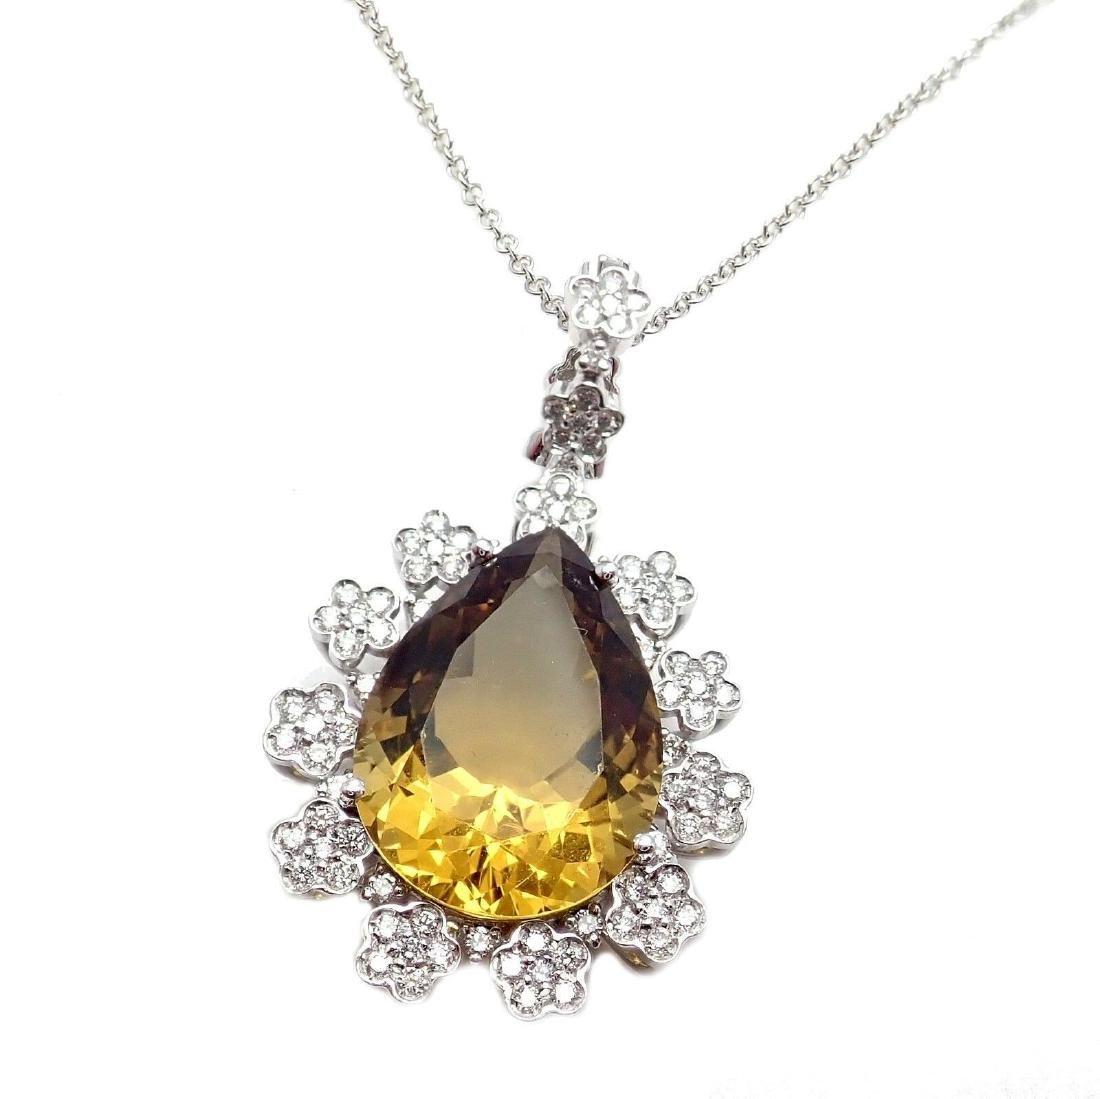 Authentic Pasquale Bruni Marilyn 18k White Gold Diamond